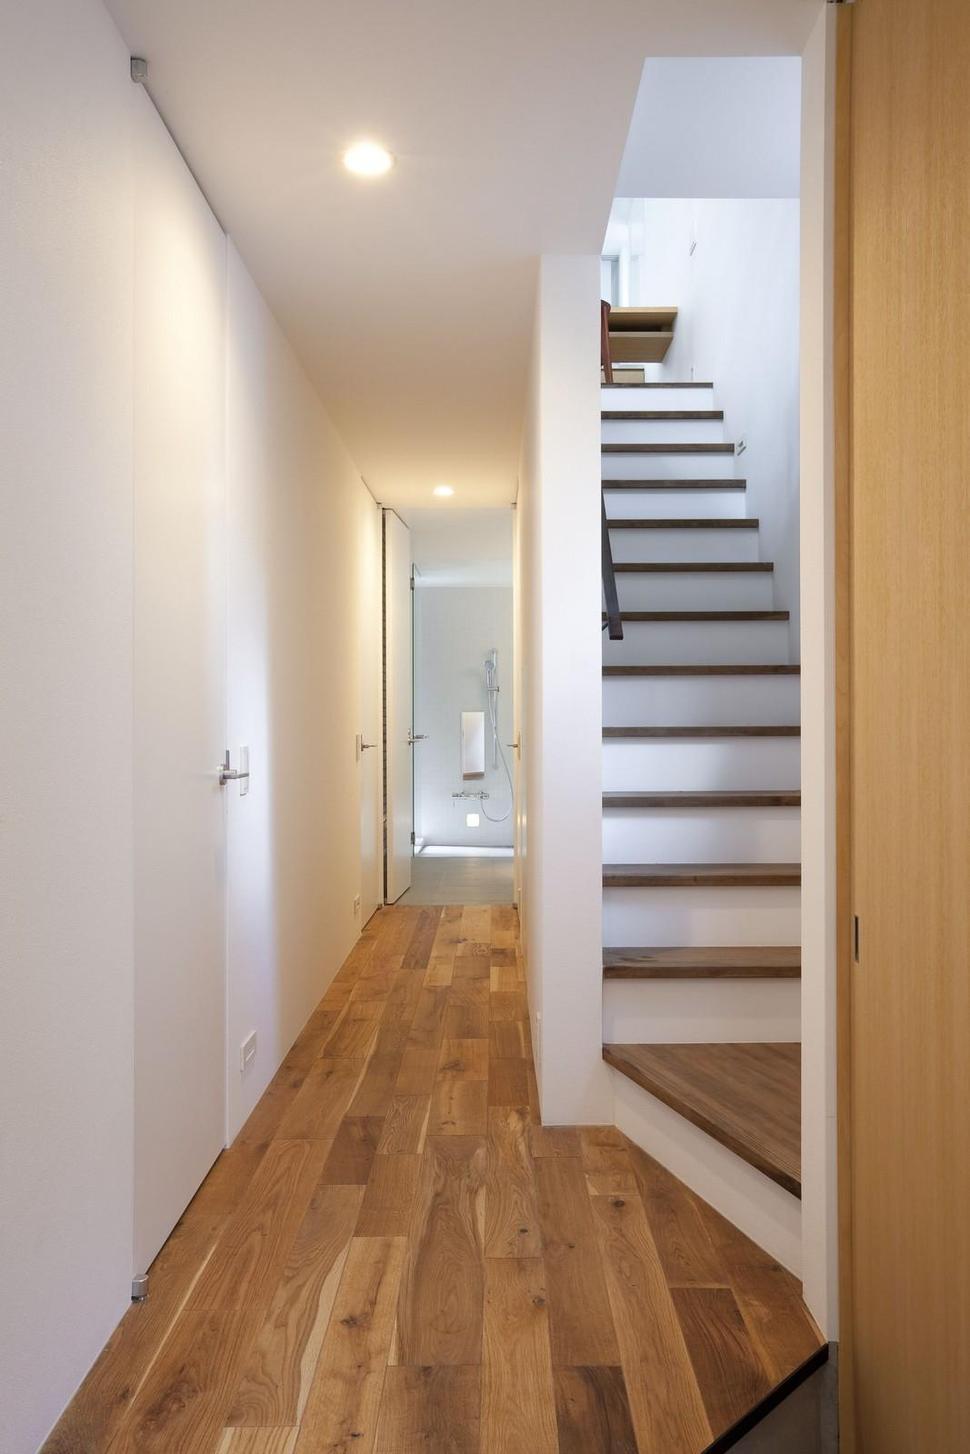 attic access ideas - Extremely Narrow House